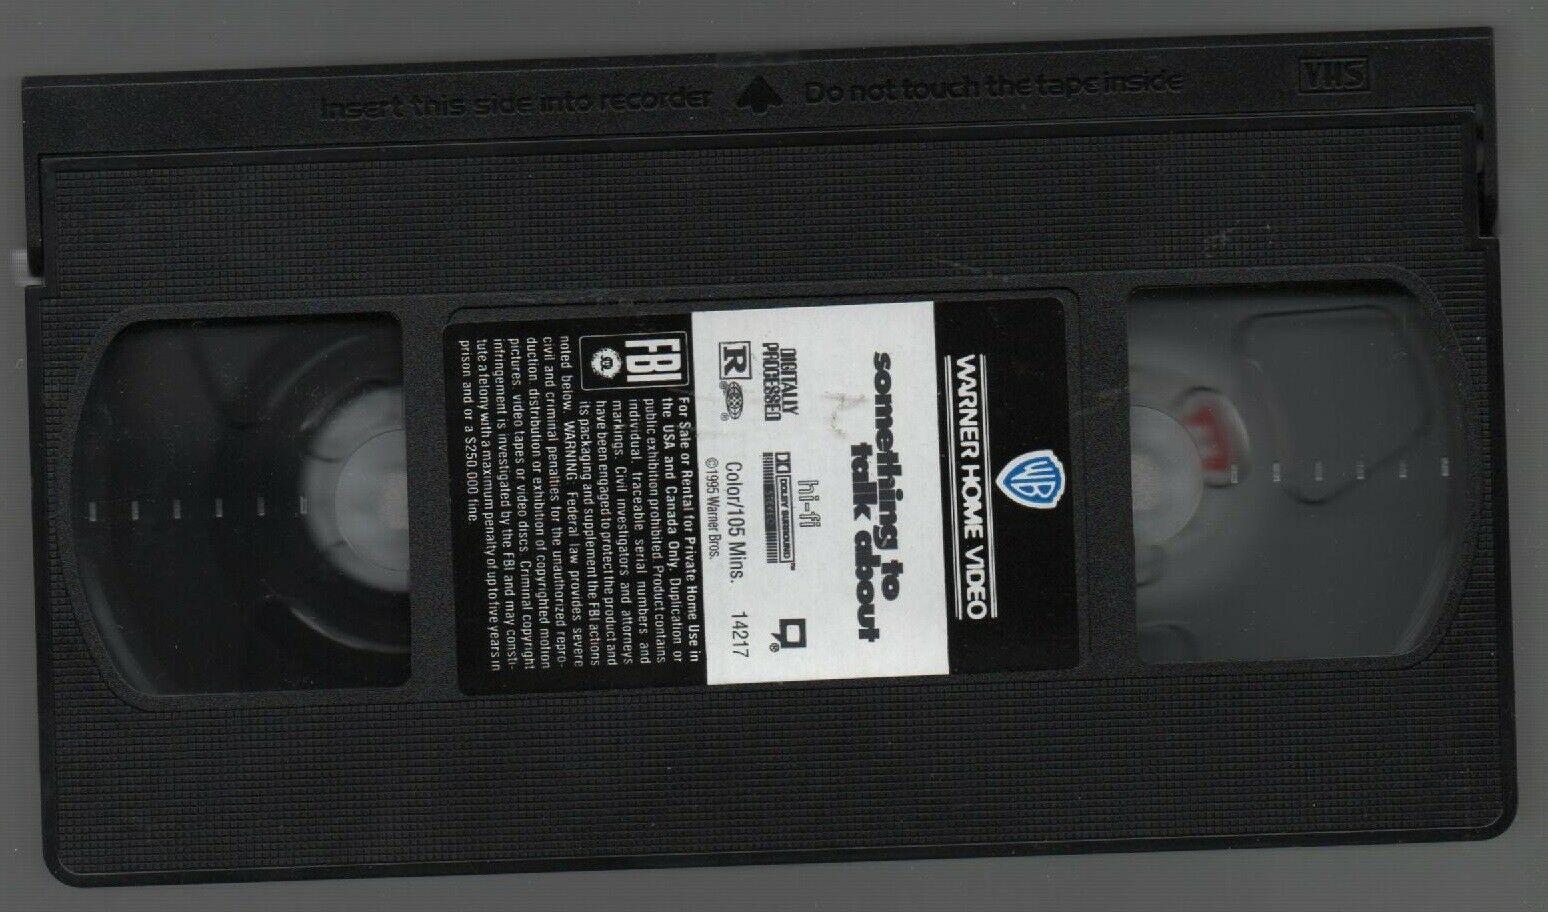 Something to Talk About - Julia Roberts, Robert Duvail - Warner Bros - VHS 14217 image 4